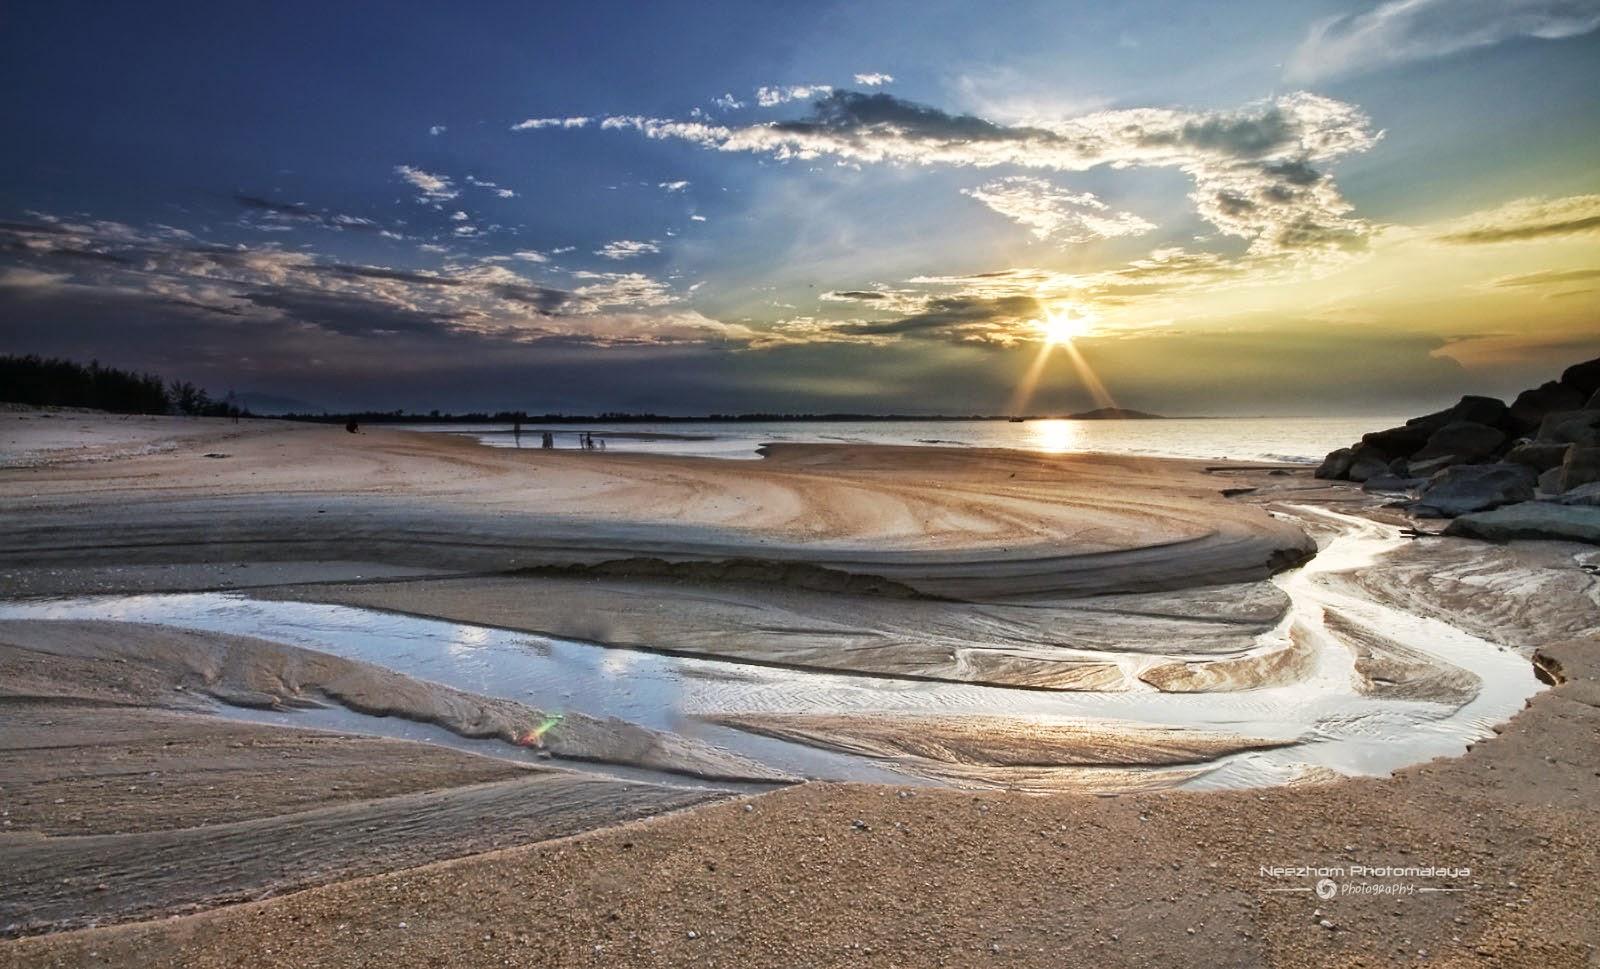 Sunset pantai Merang dengan lekuk-lekuk air di pasir